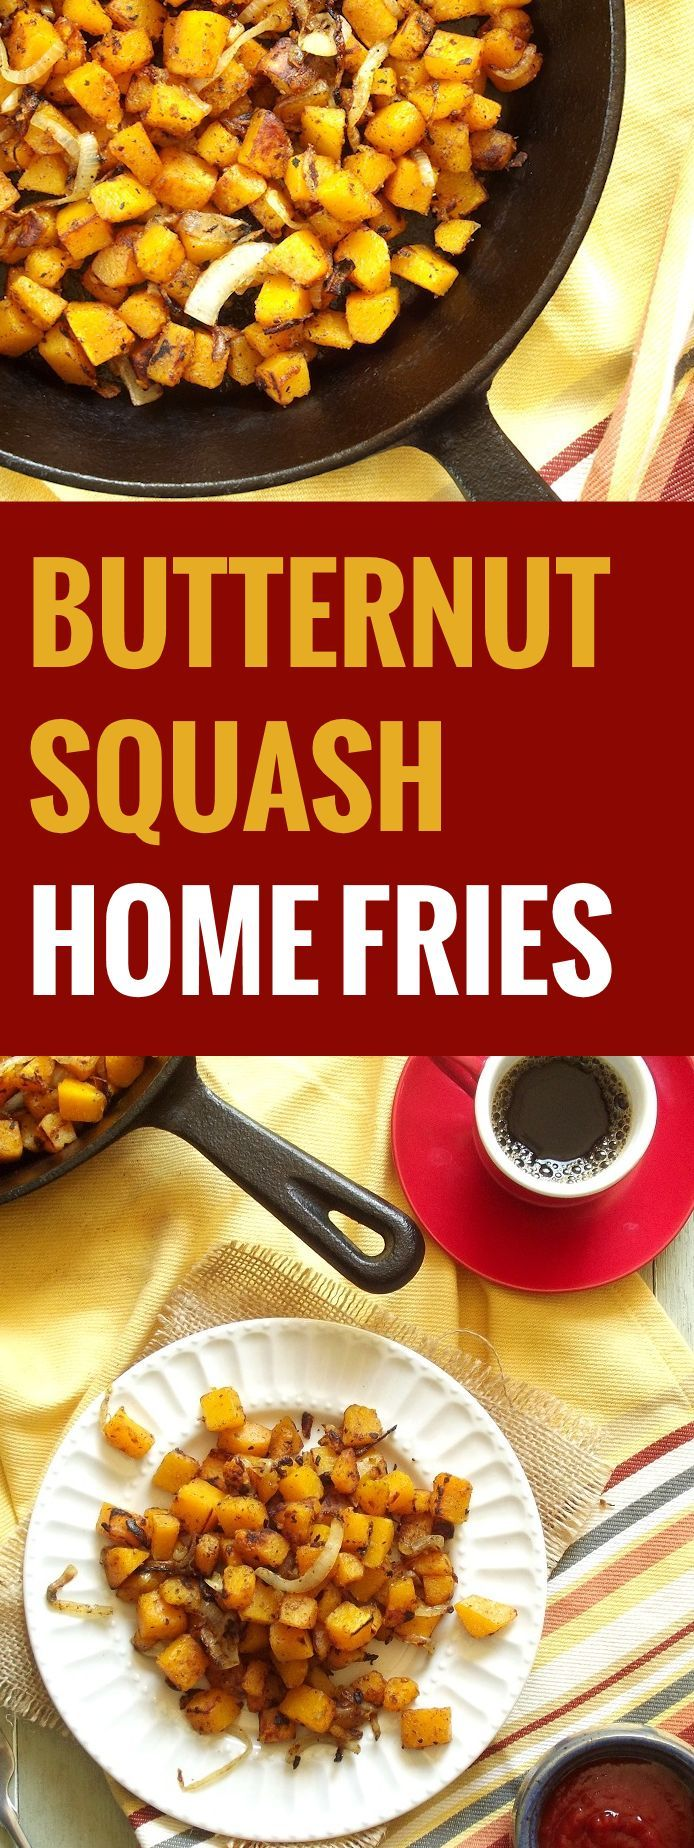 Butternut Squash Home Fries